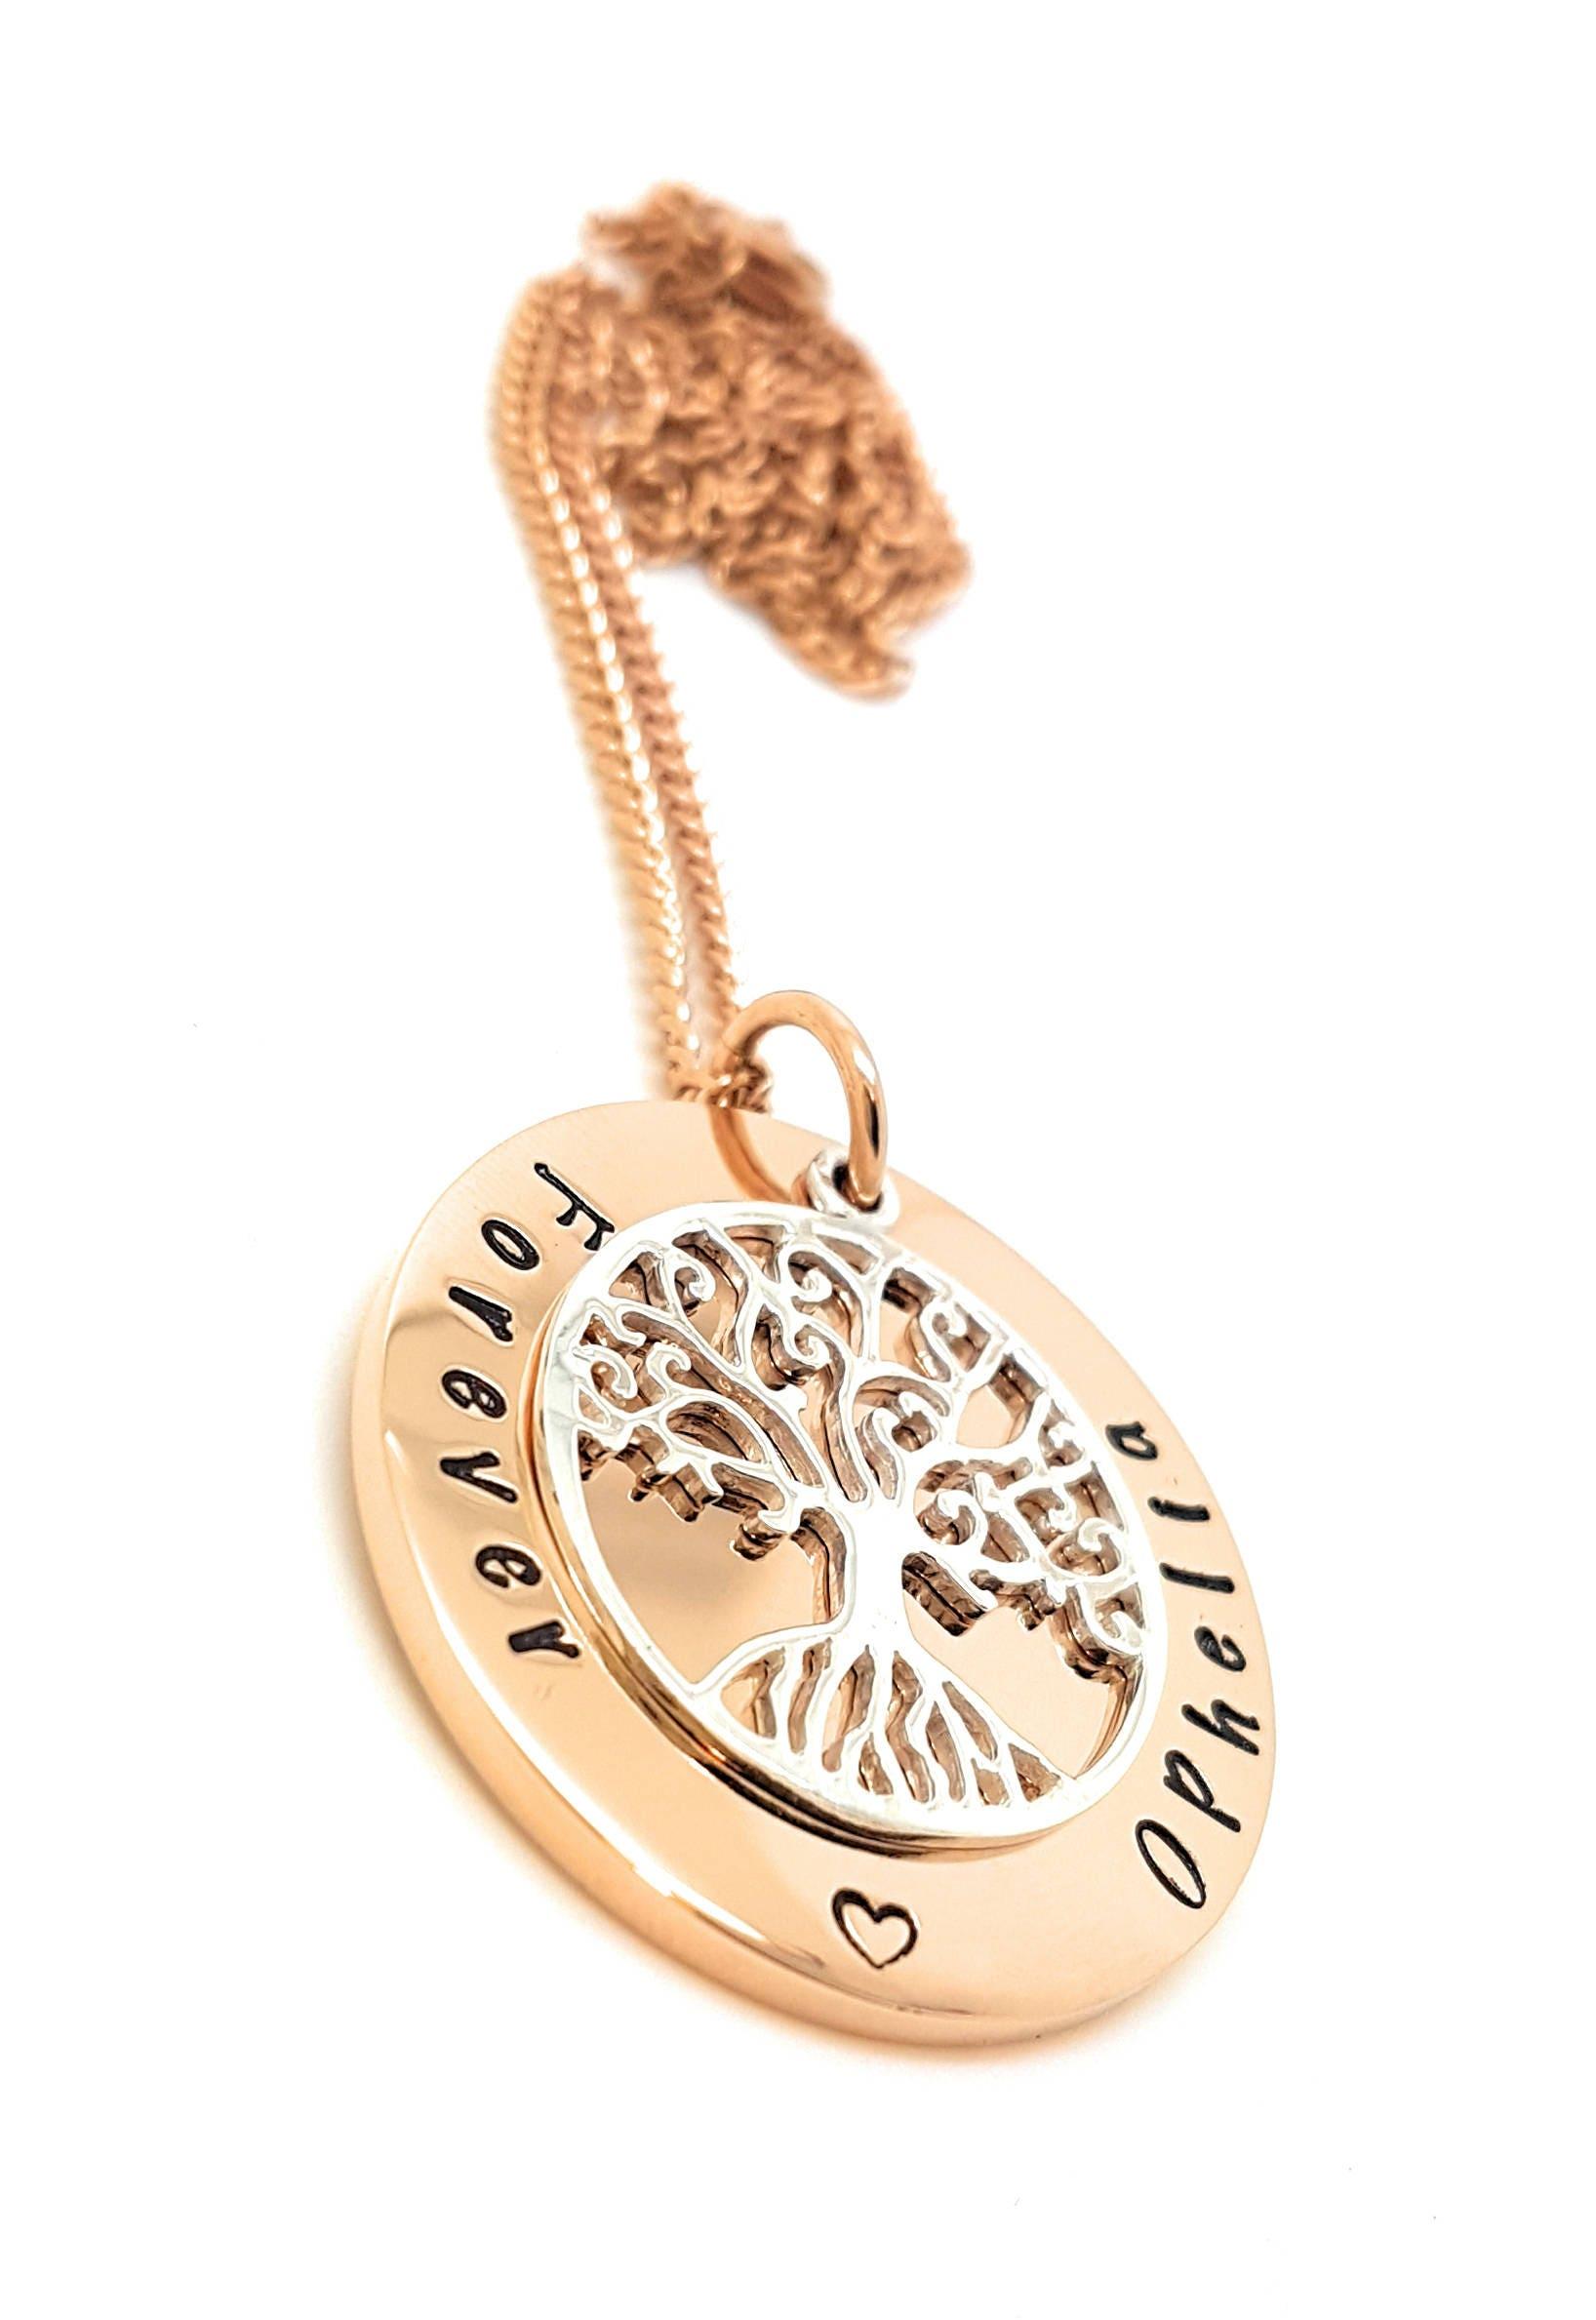 Family names tree of life pendant personalised jewellery hand gallery photo gallery photo gallery photo aloadofball Images